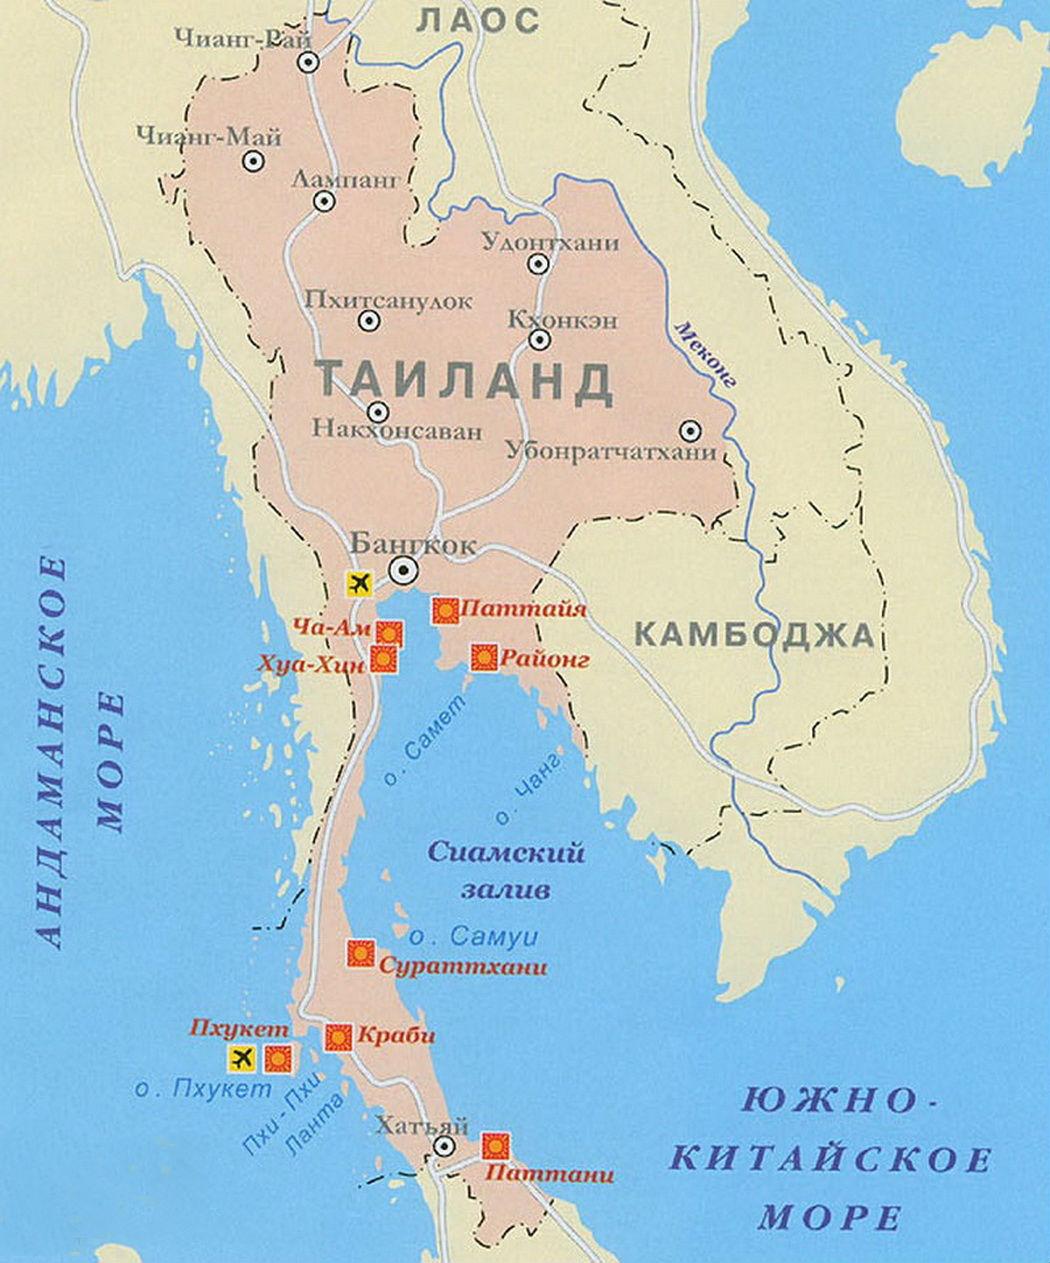 Тайланд где находится карта